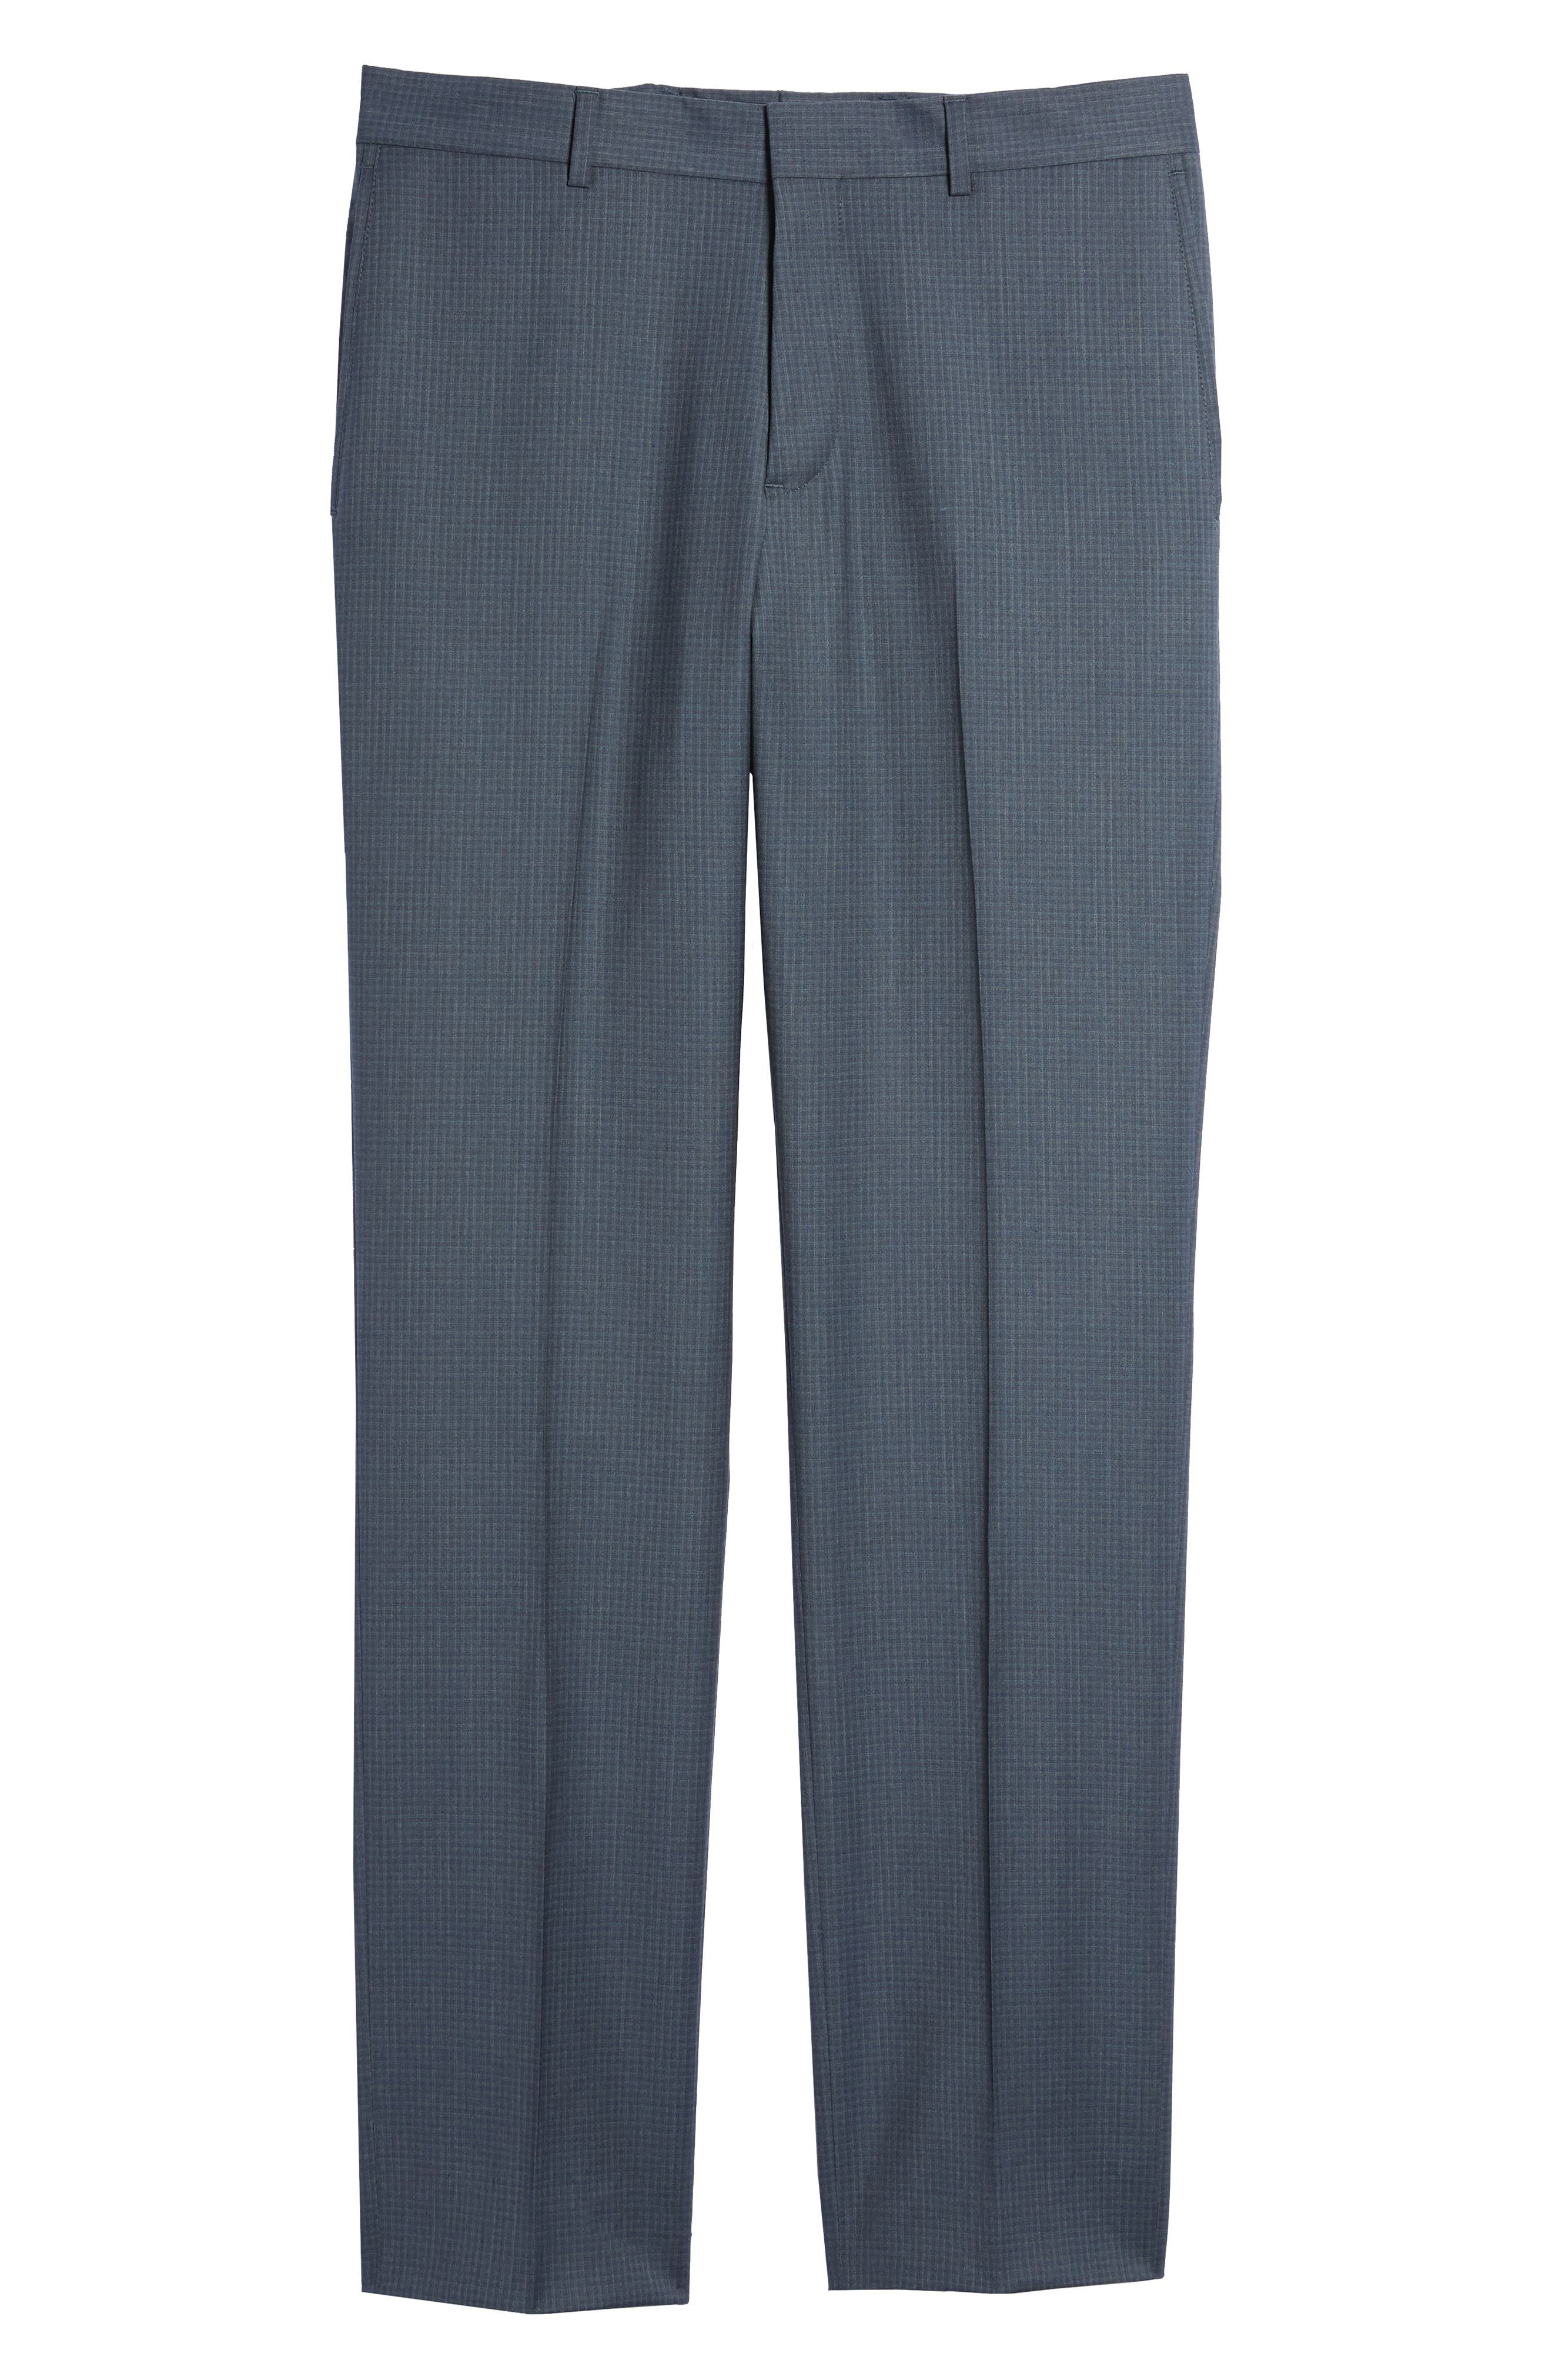 Tech-Smart Check Flat Front Stretch Wool Pants,                             Alternate thumbnail 6, color,                             030